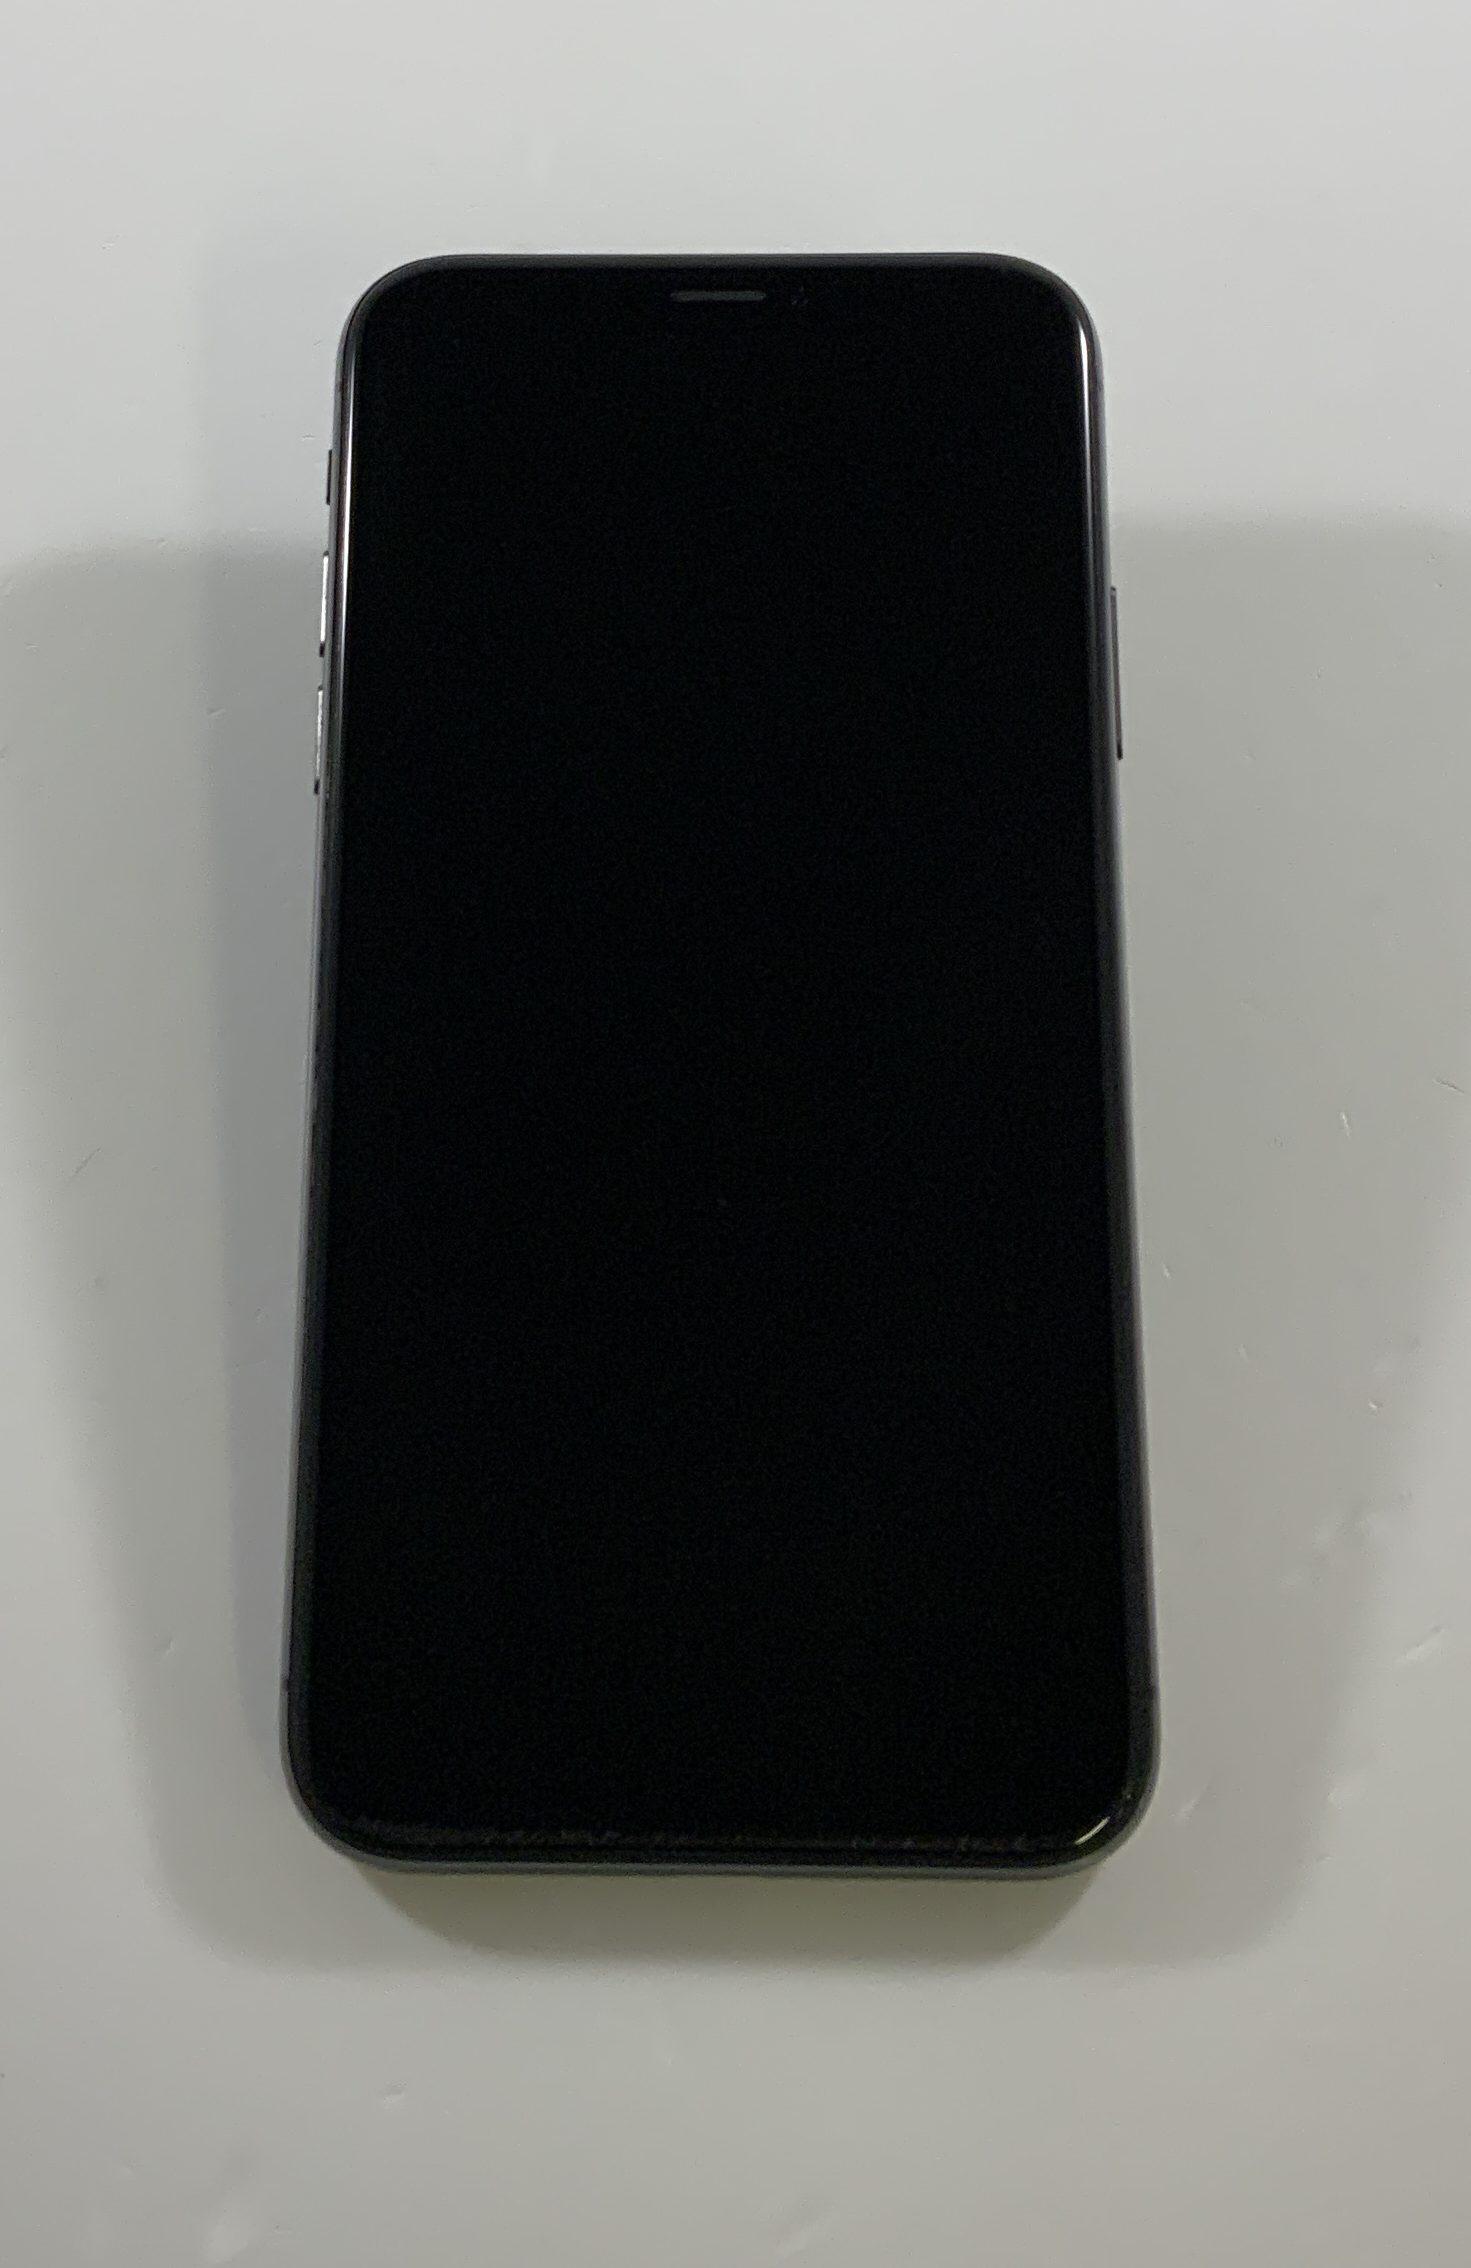 iPhone X 64GB, 64GB, Space Gray, bild 1